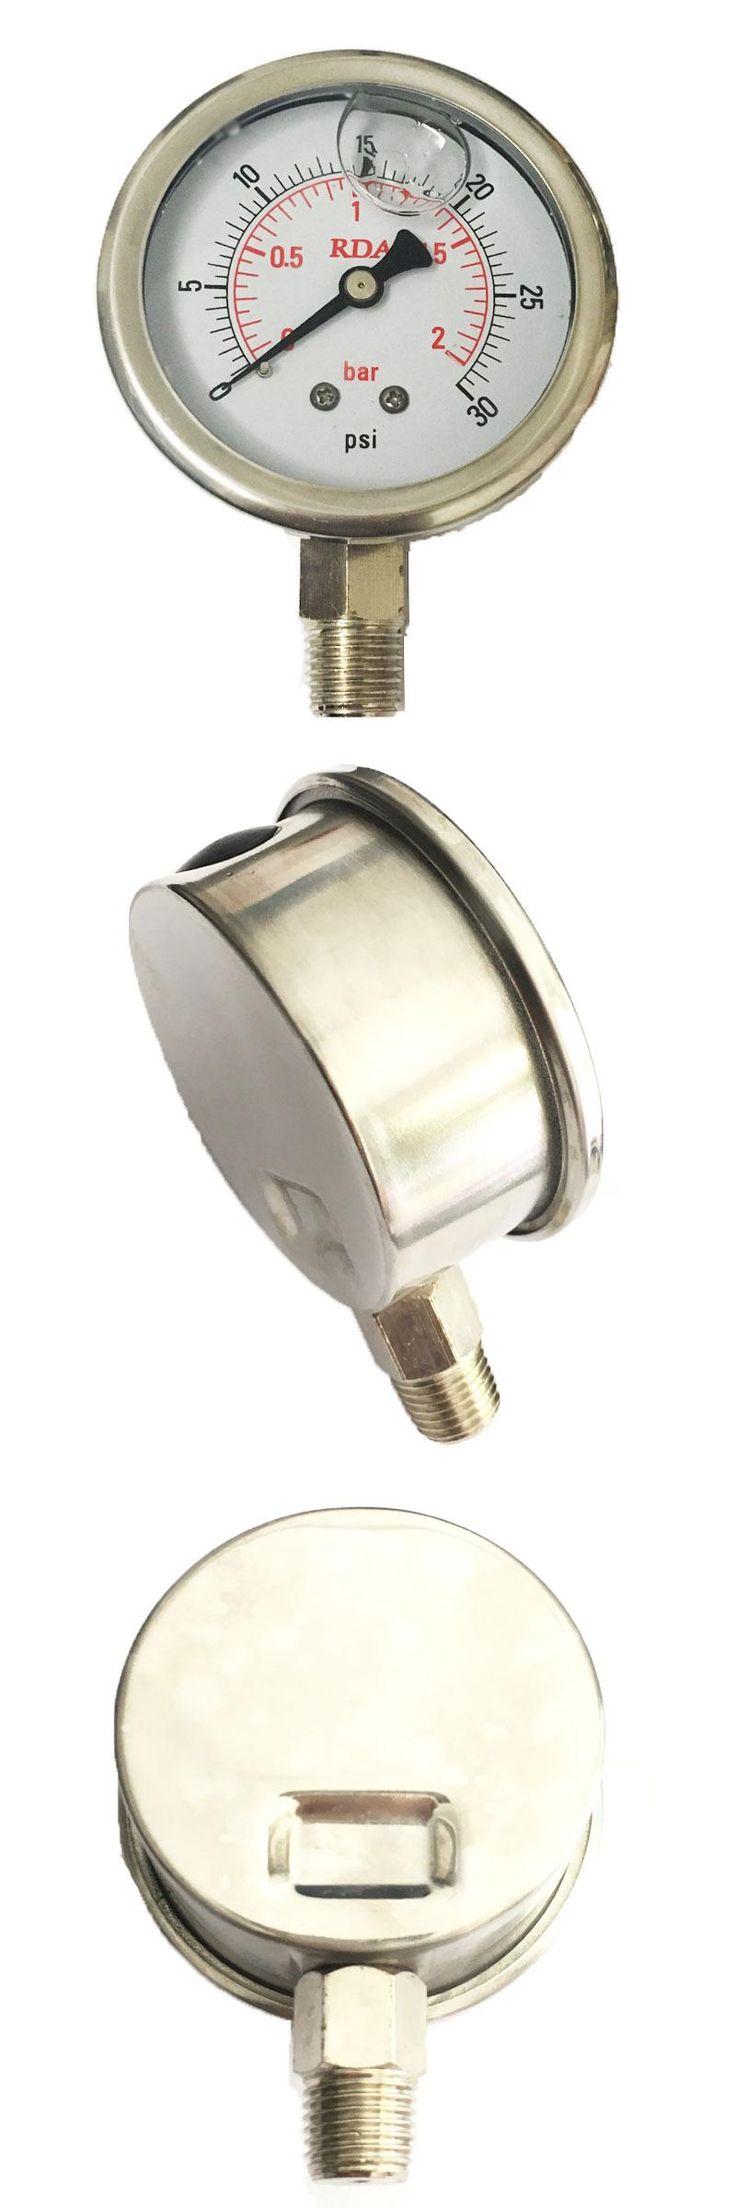 [Visit to Buy] 0-30 PSI 2Bar Stainless Steel Liquid Filled Pressure Gauge #Advertisement